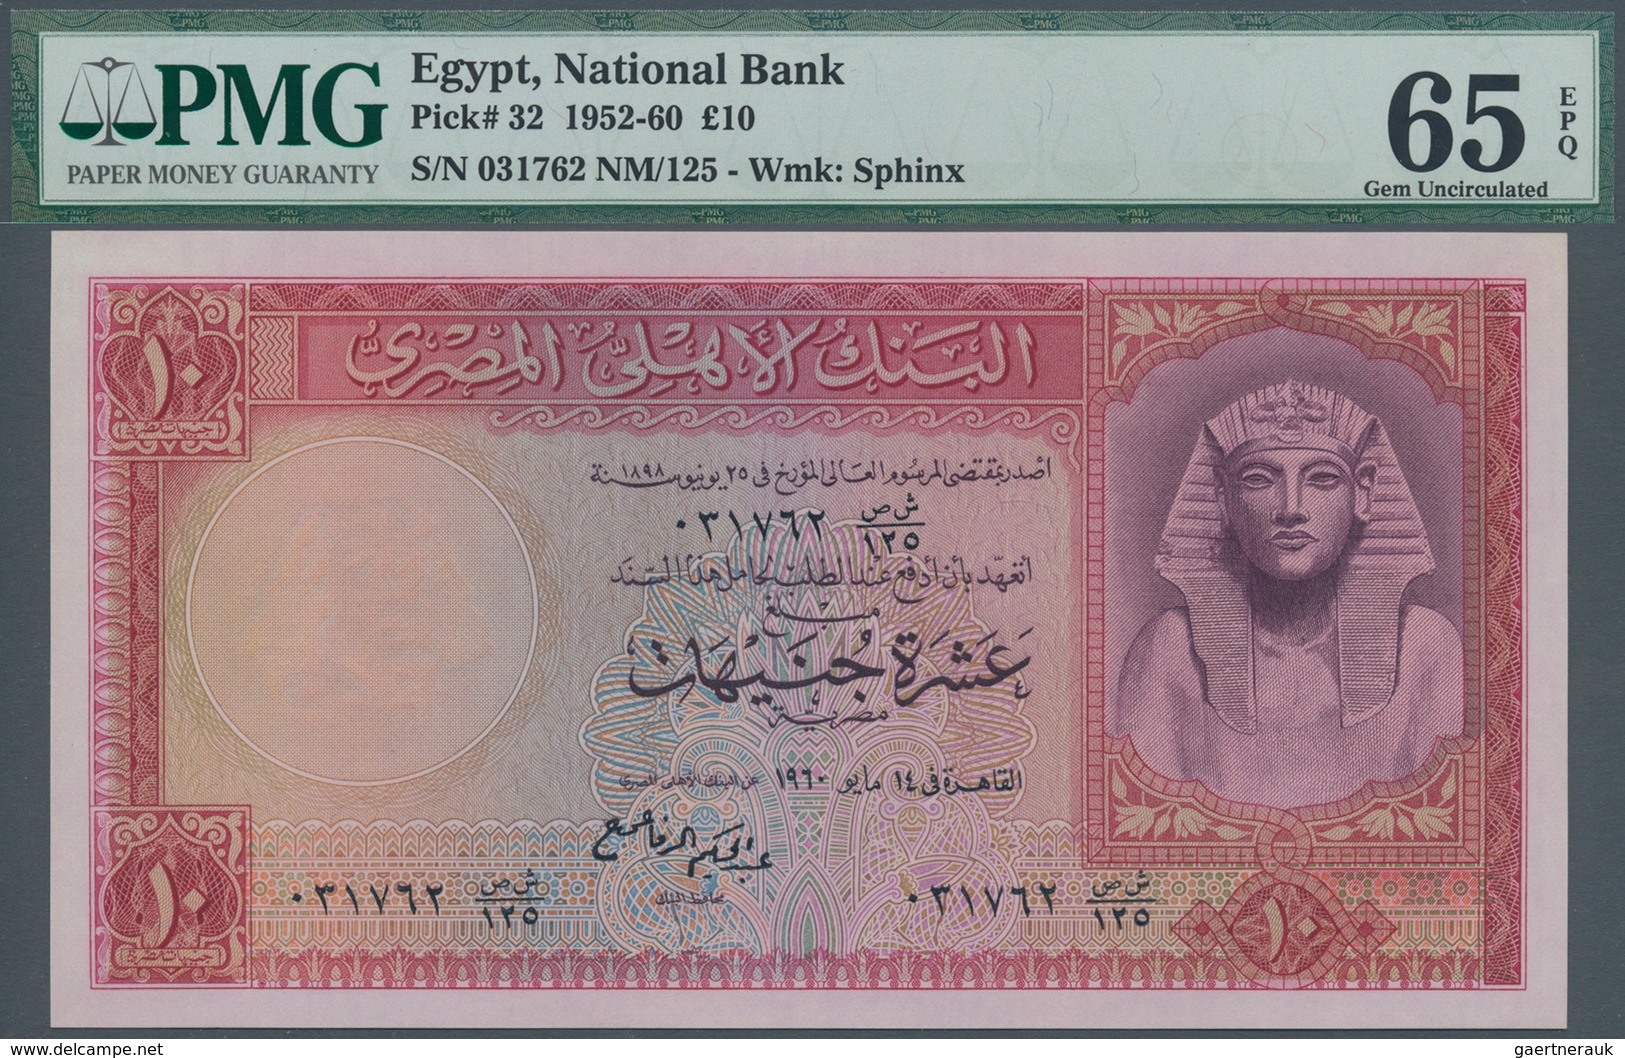 Egypt / Ägypten: 10 Pounds 1960 P. 32d, Crisp Uncirculated Banknote With Bright Original Colors, No - Egypt